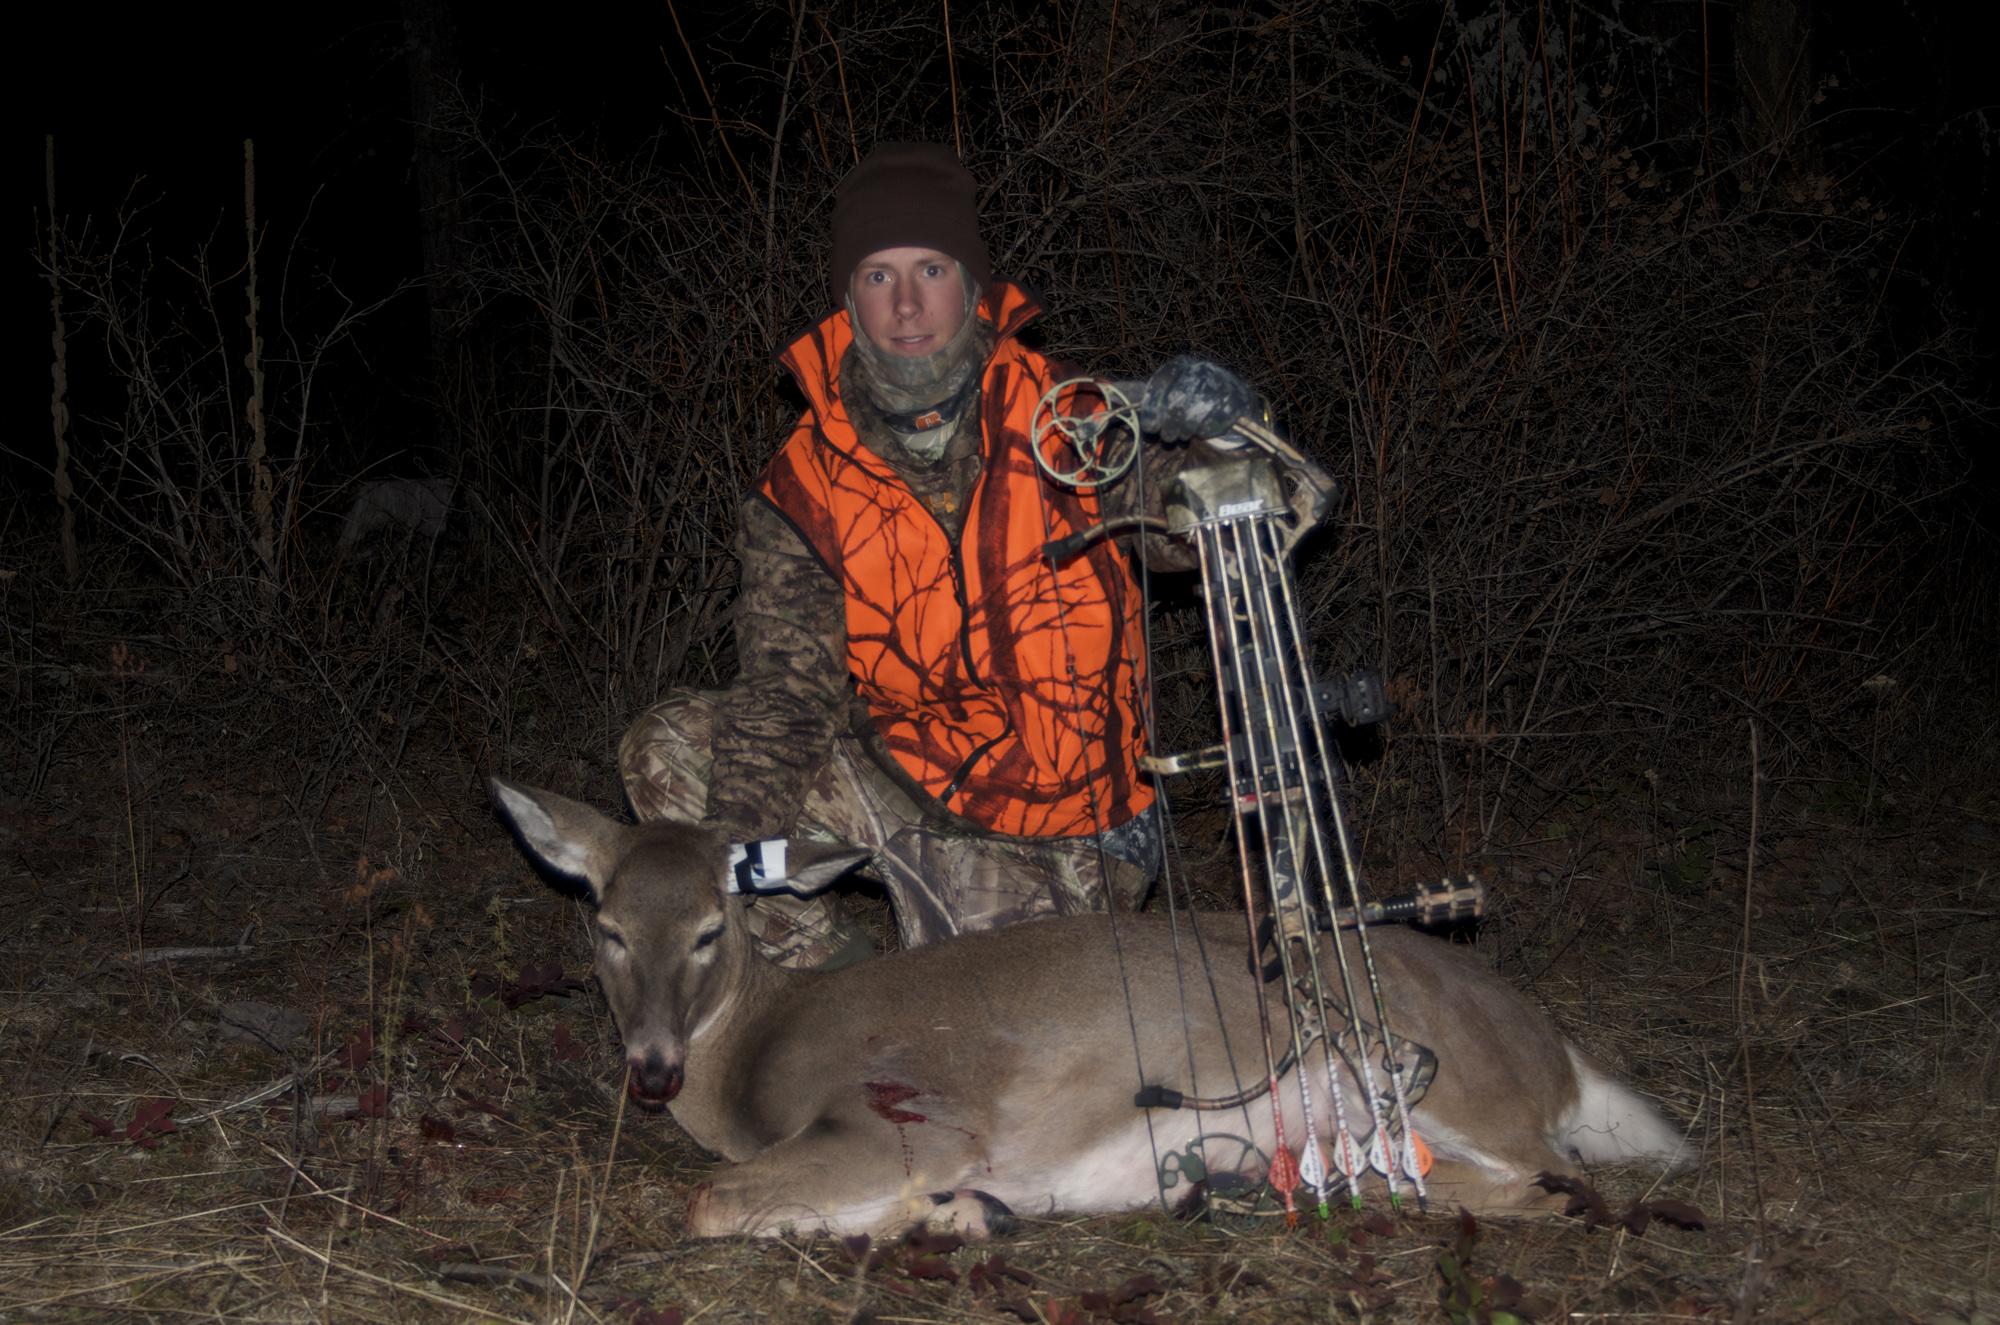 Montana Wild, Bear Carnage, Travis Boughton, G5 T3 broadhead, NW Montana Deer Hunting, Whitetail Doe, deer heart shot, easton FMJ axis arrow, trophy ridge hitman 7, Sitka outerwear, Danner Pronghorn, Russell Outdoors Apparel, Montana Hunting region 170